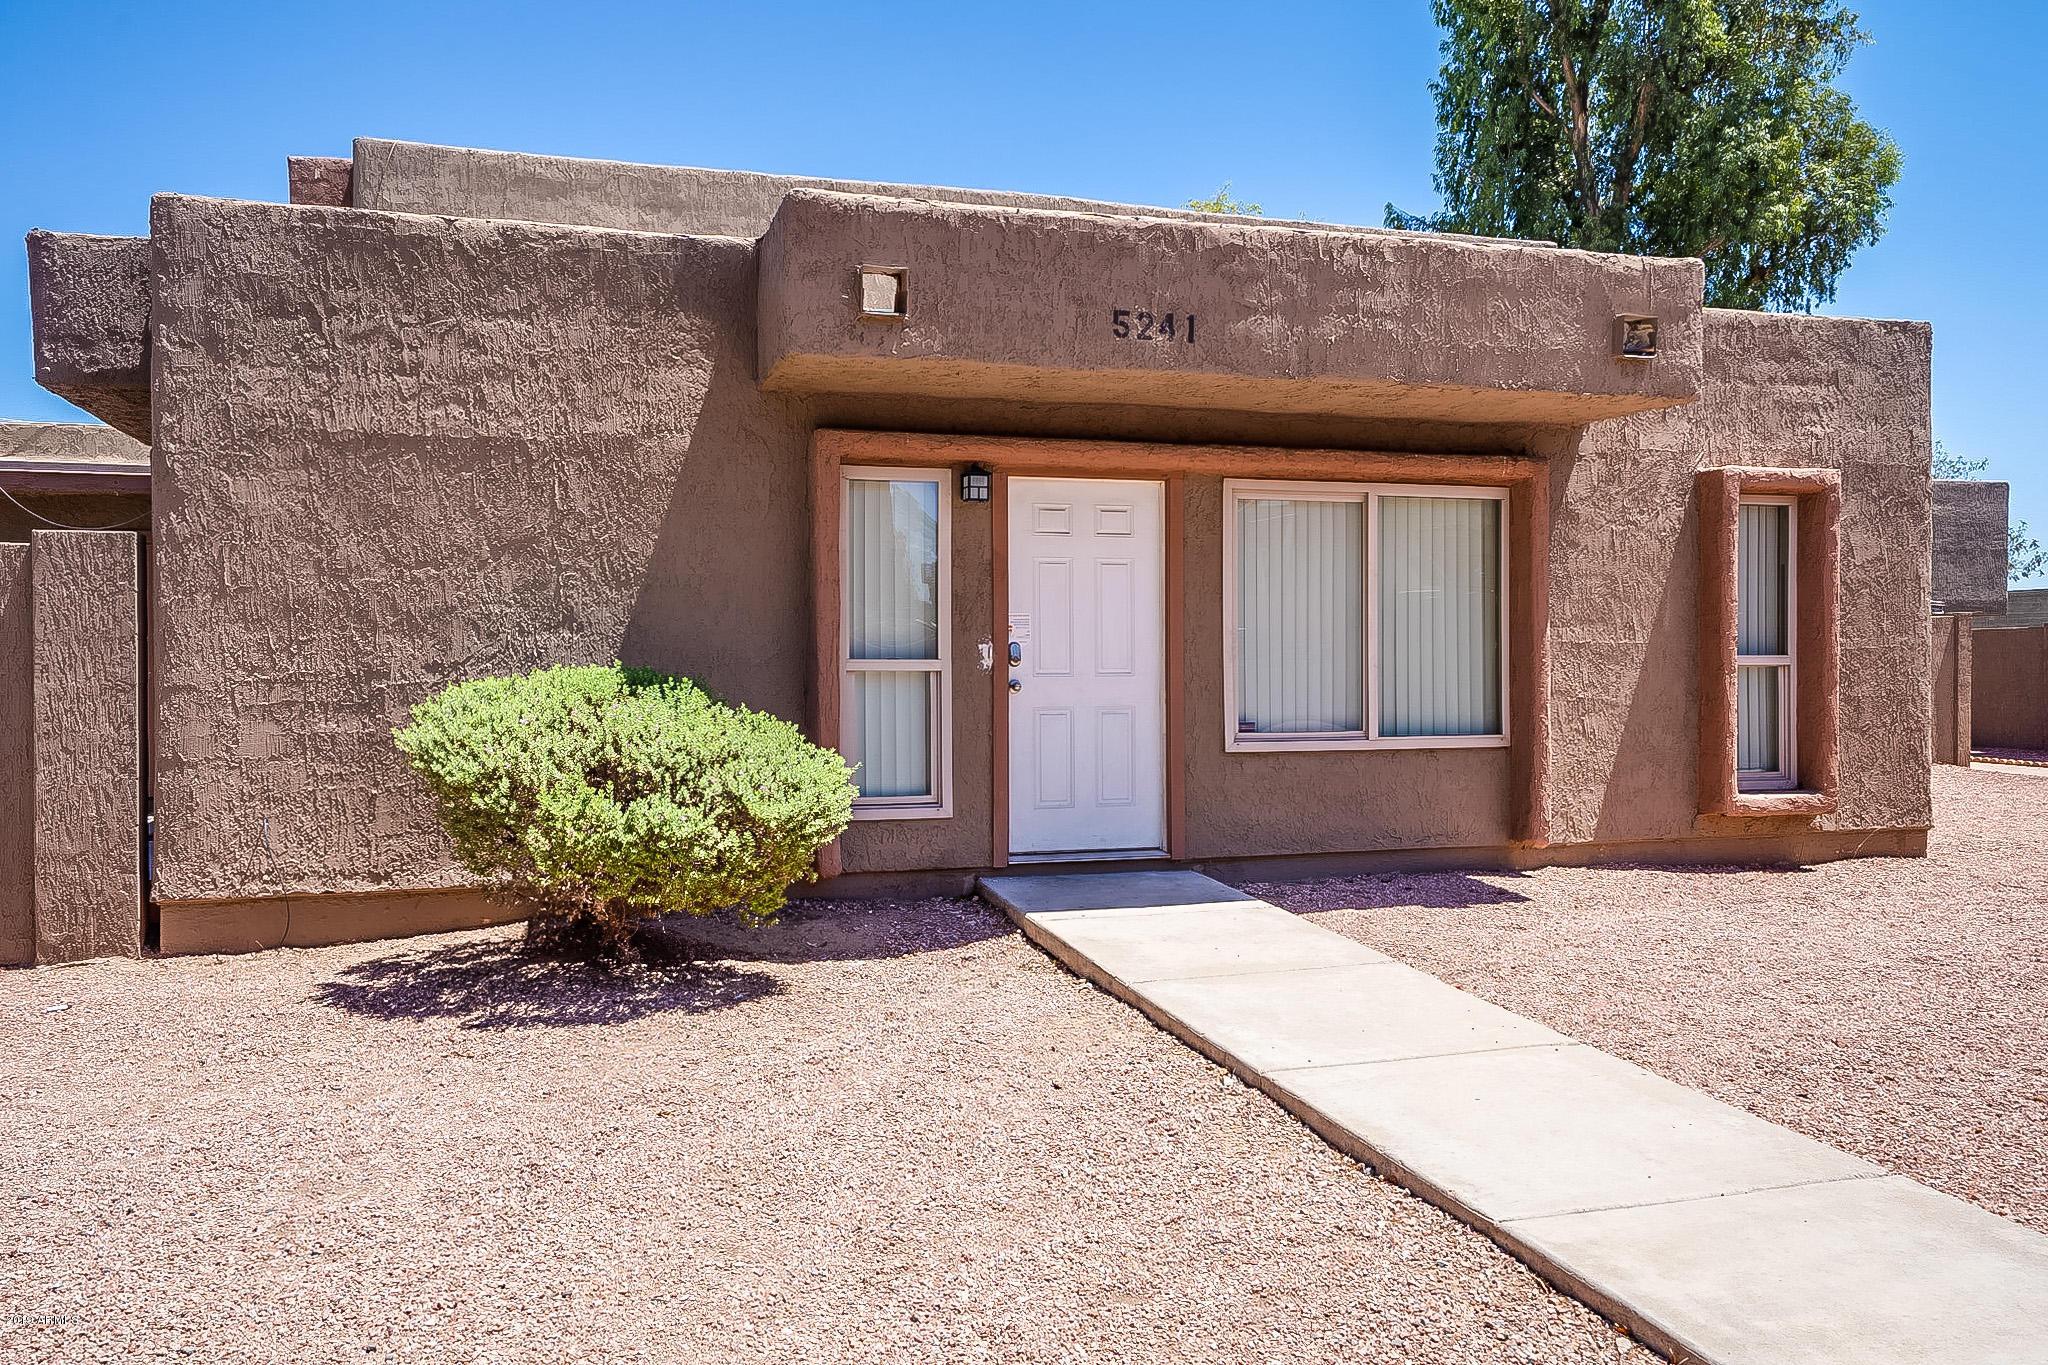 Photo for 5241 W Willetta Street, Phoenix, AZ 85043 (MLS # 5964847)